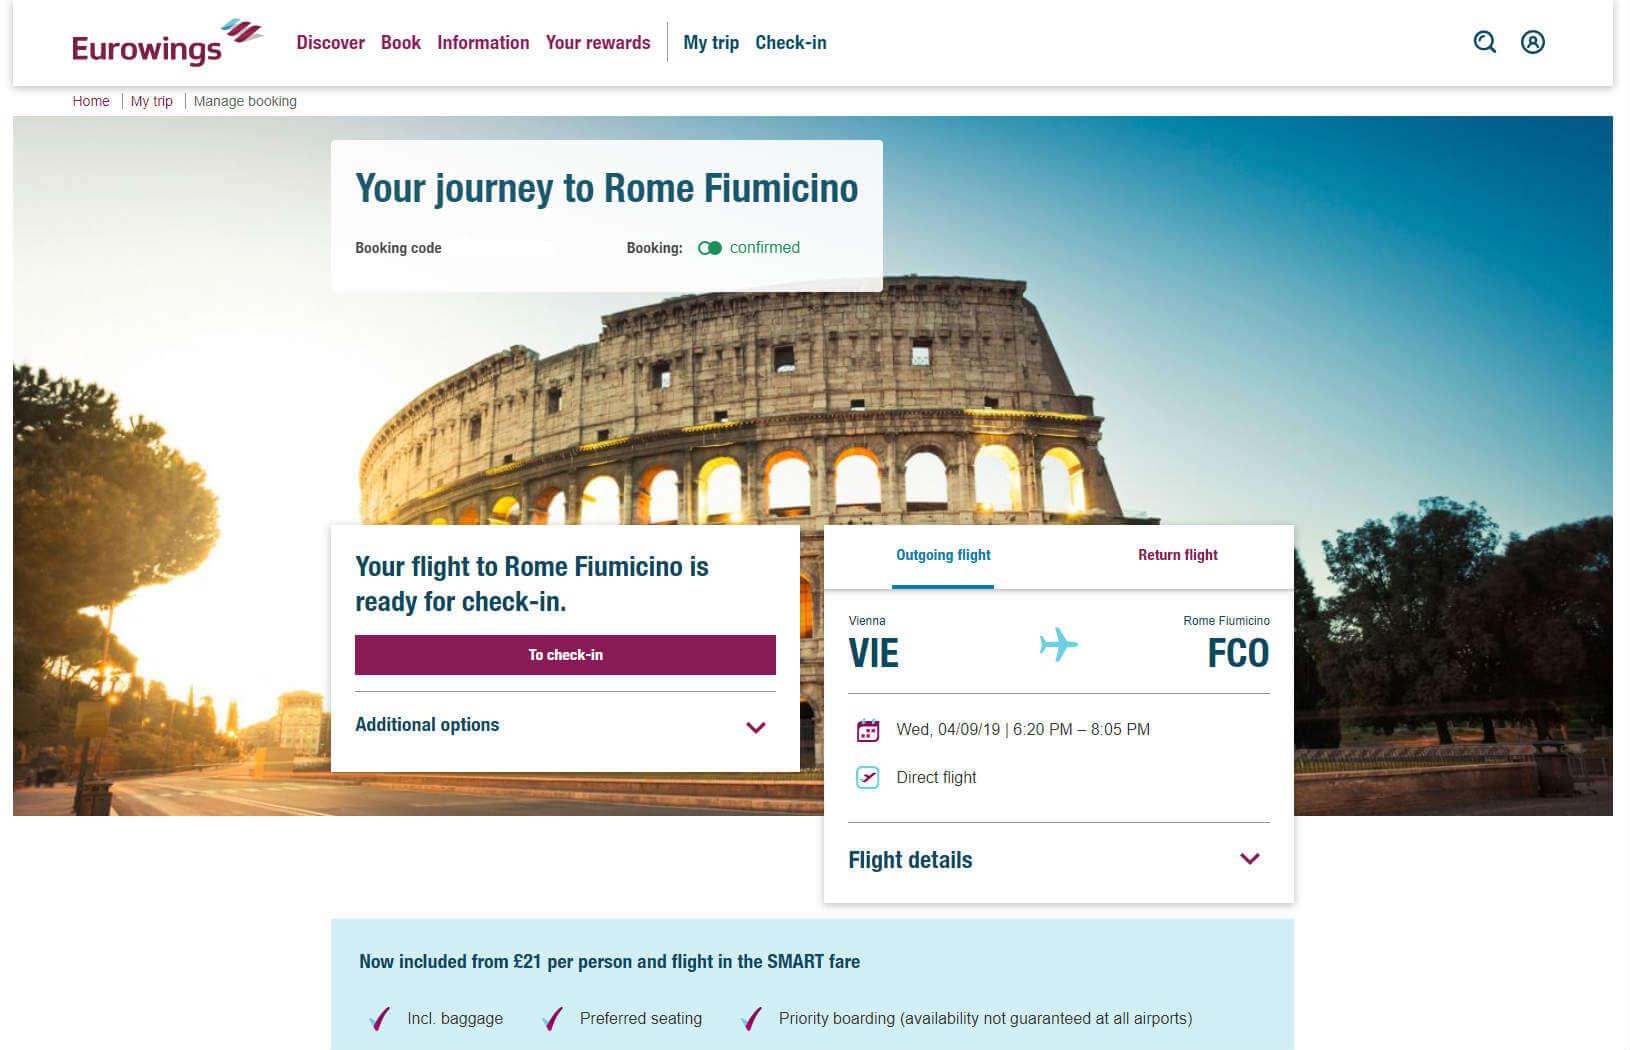 Eurowings Check-in – Informácie o lete